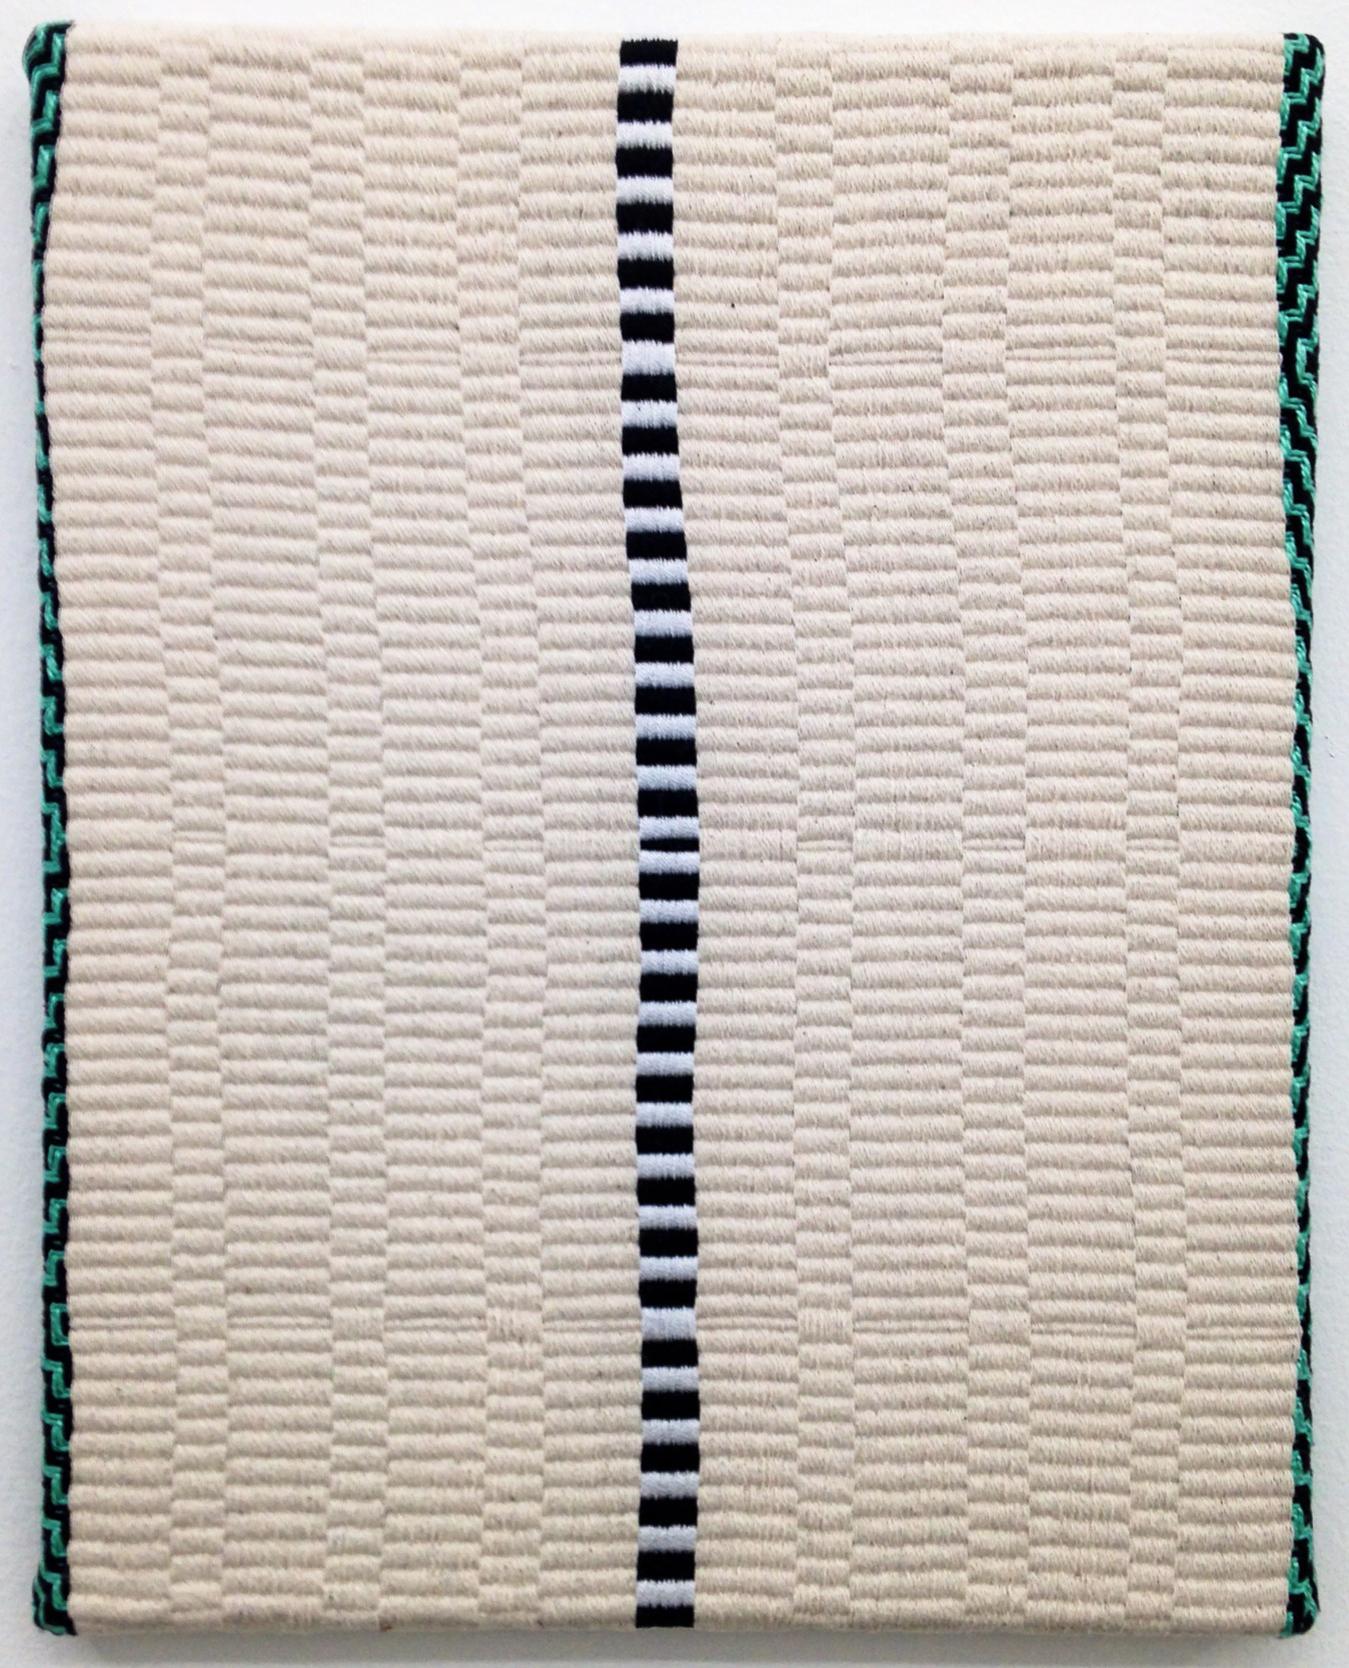 Bittman_06_Untitled_2014_handwoven textile cotton_15x12.jpg